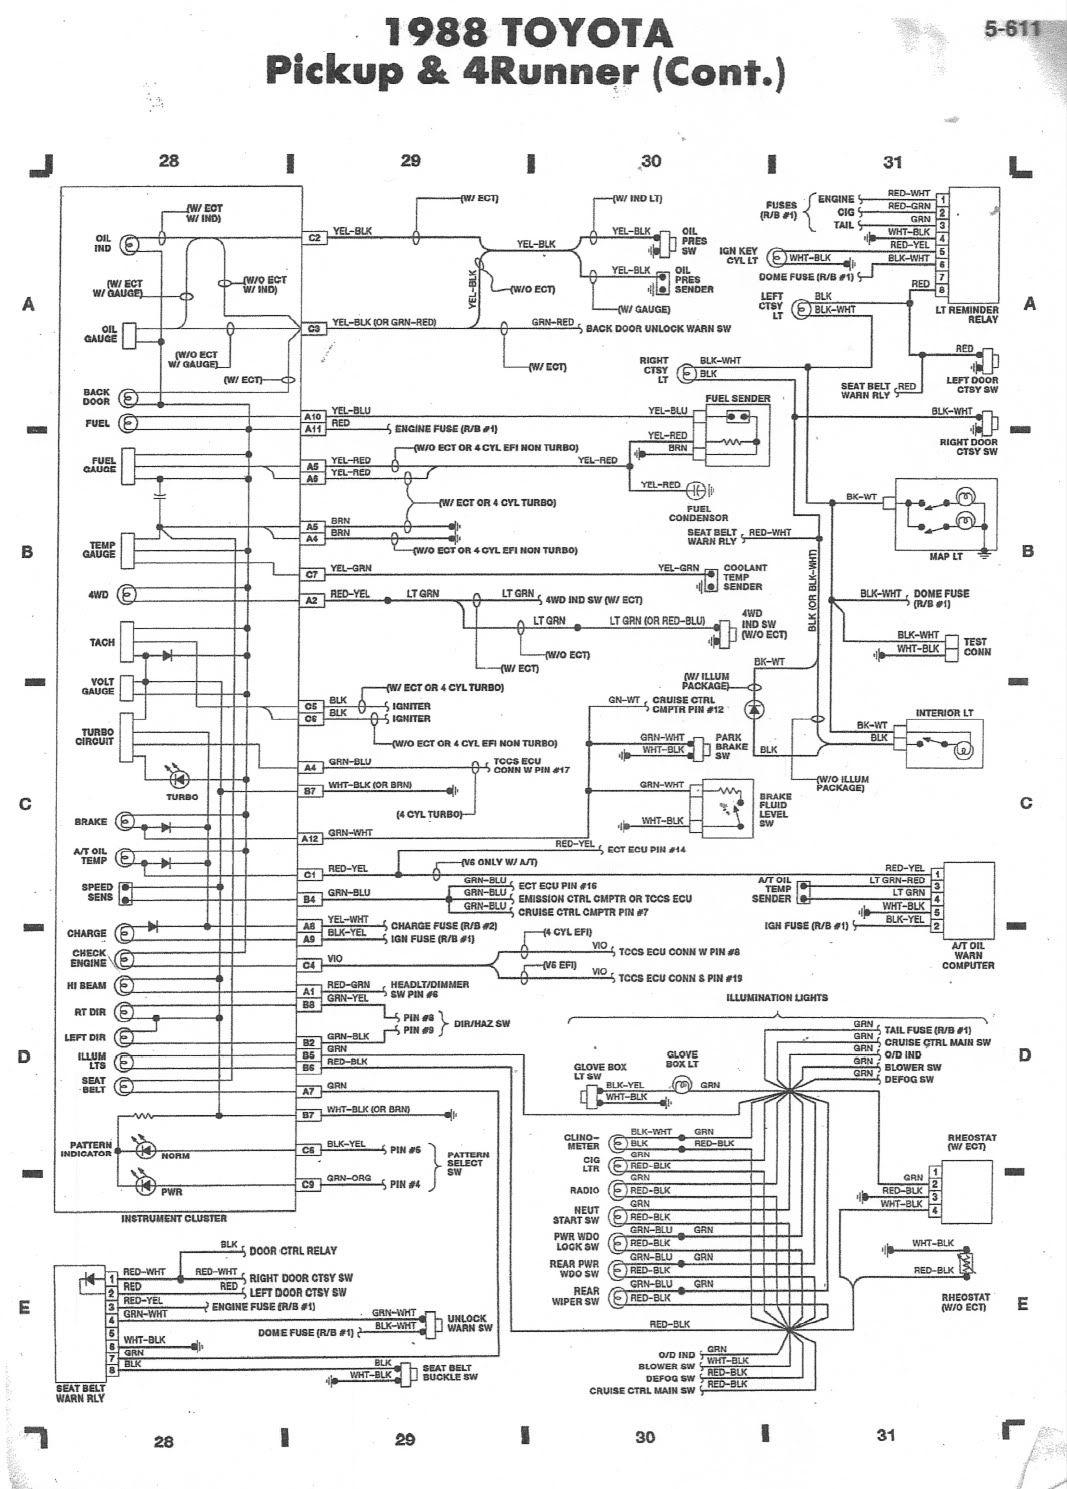 1989 toyota pickup schematic automotive wiring diagram u2022 rh wiringblog today